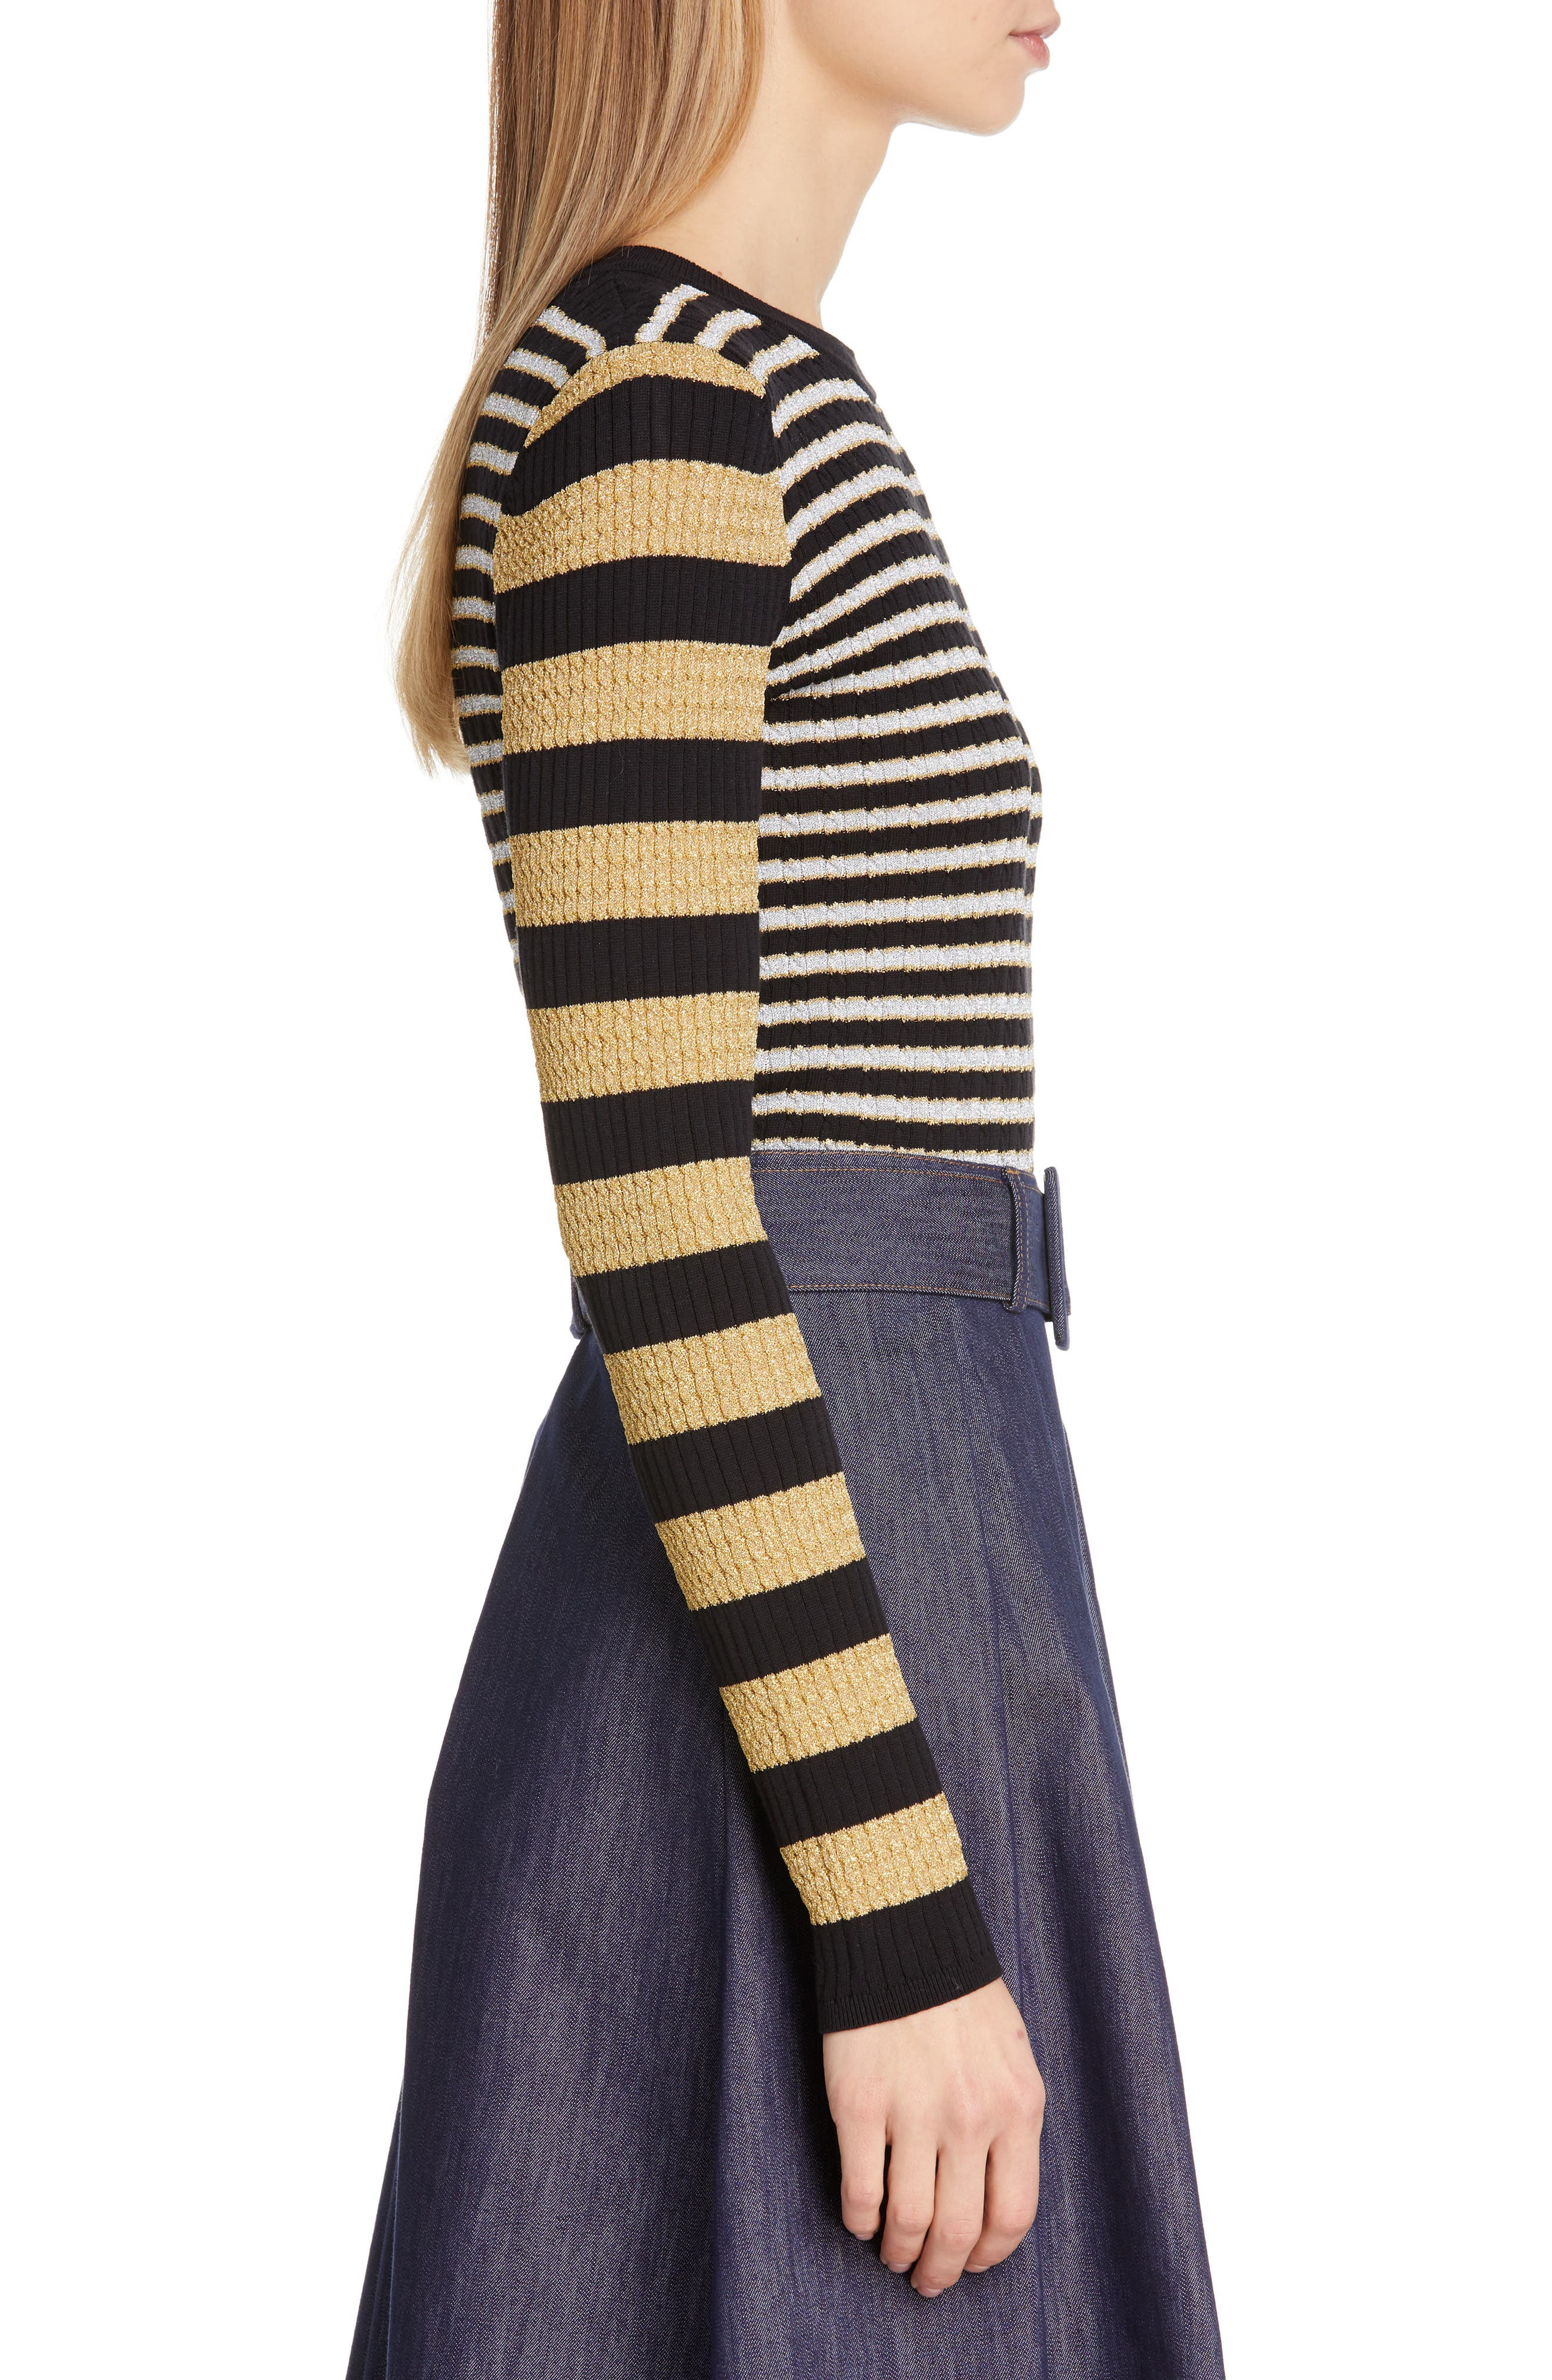 TOMMY X ZENDAYA, Metallic Stripe Knit Top, Alternate thumbnail 3, color, BLACK BEAUTY MULTI